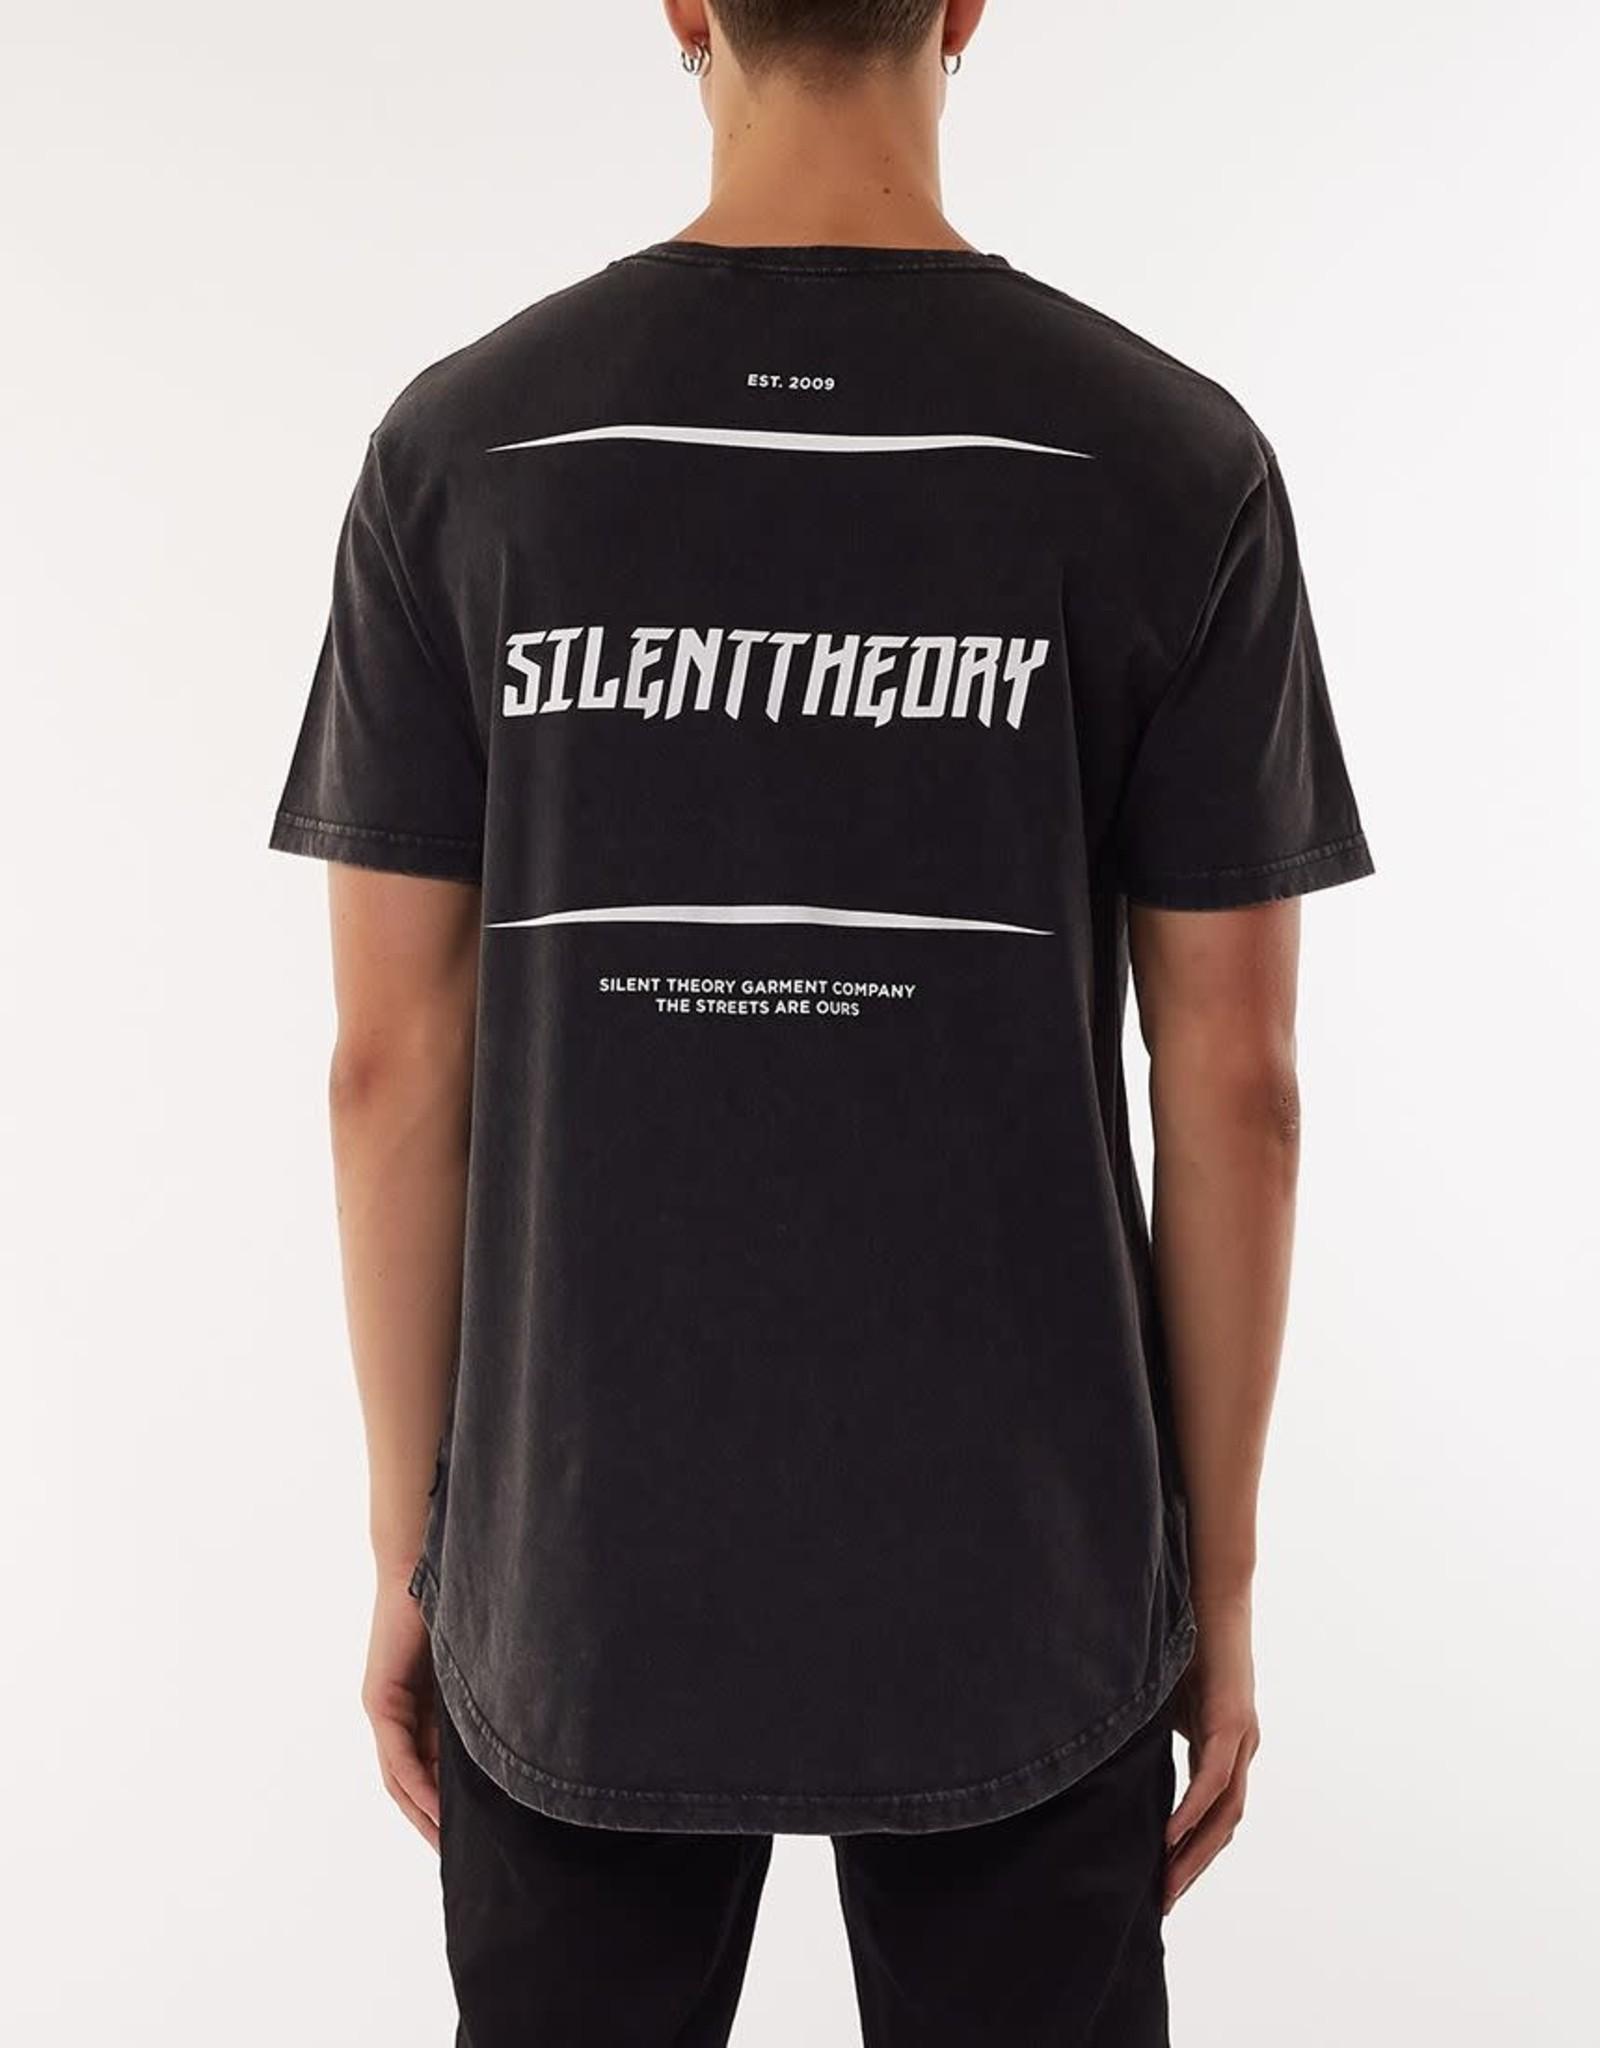 SILENT THEORY Prey Tee